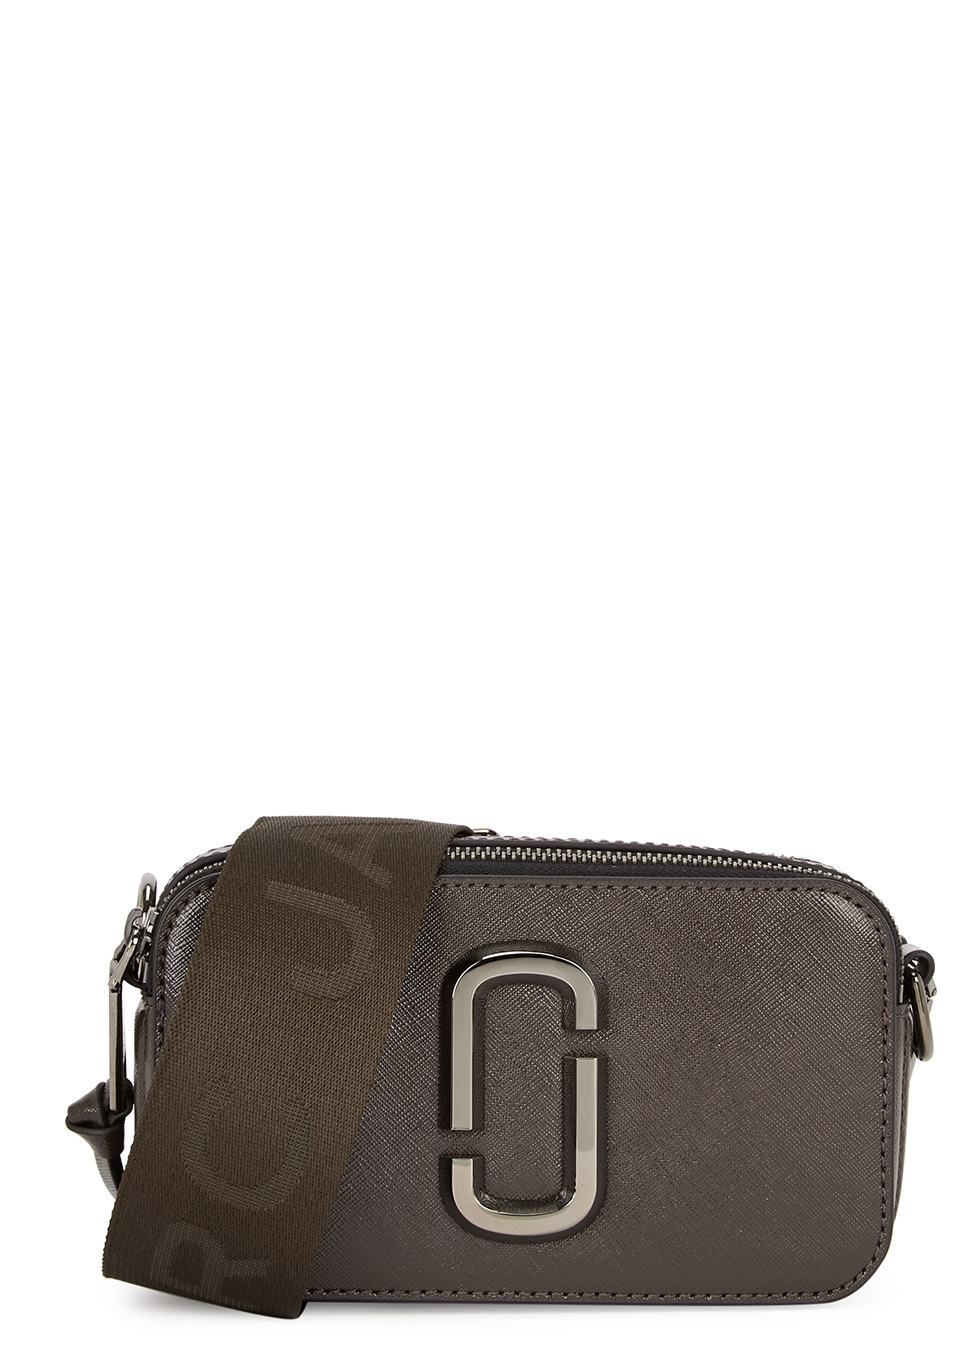 The Snapshot dark brown leather cross-body bag